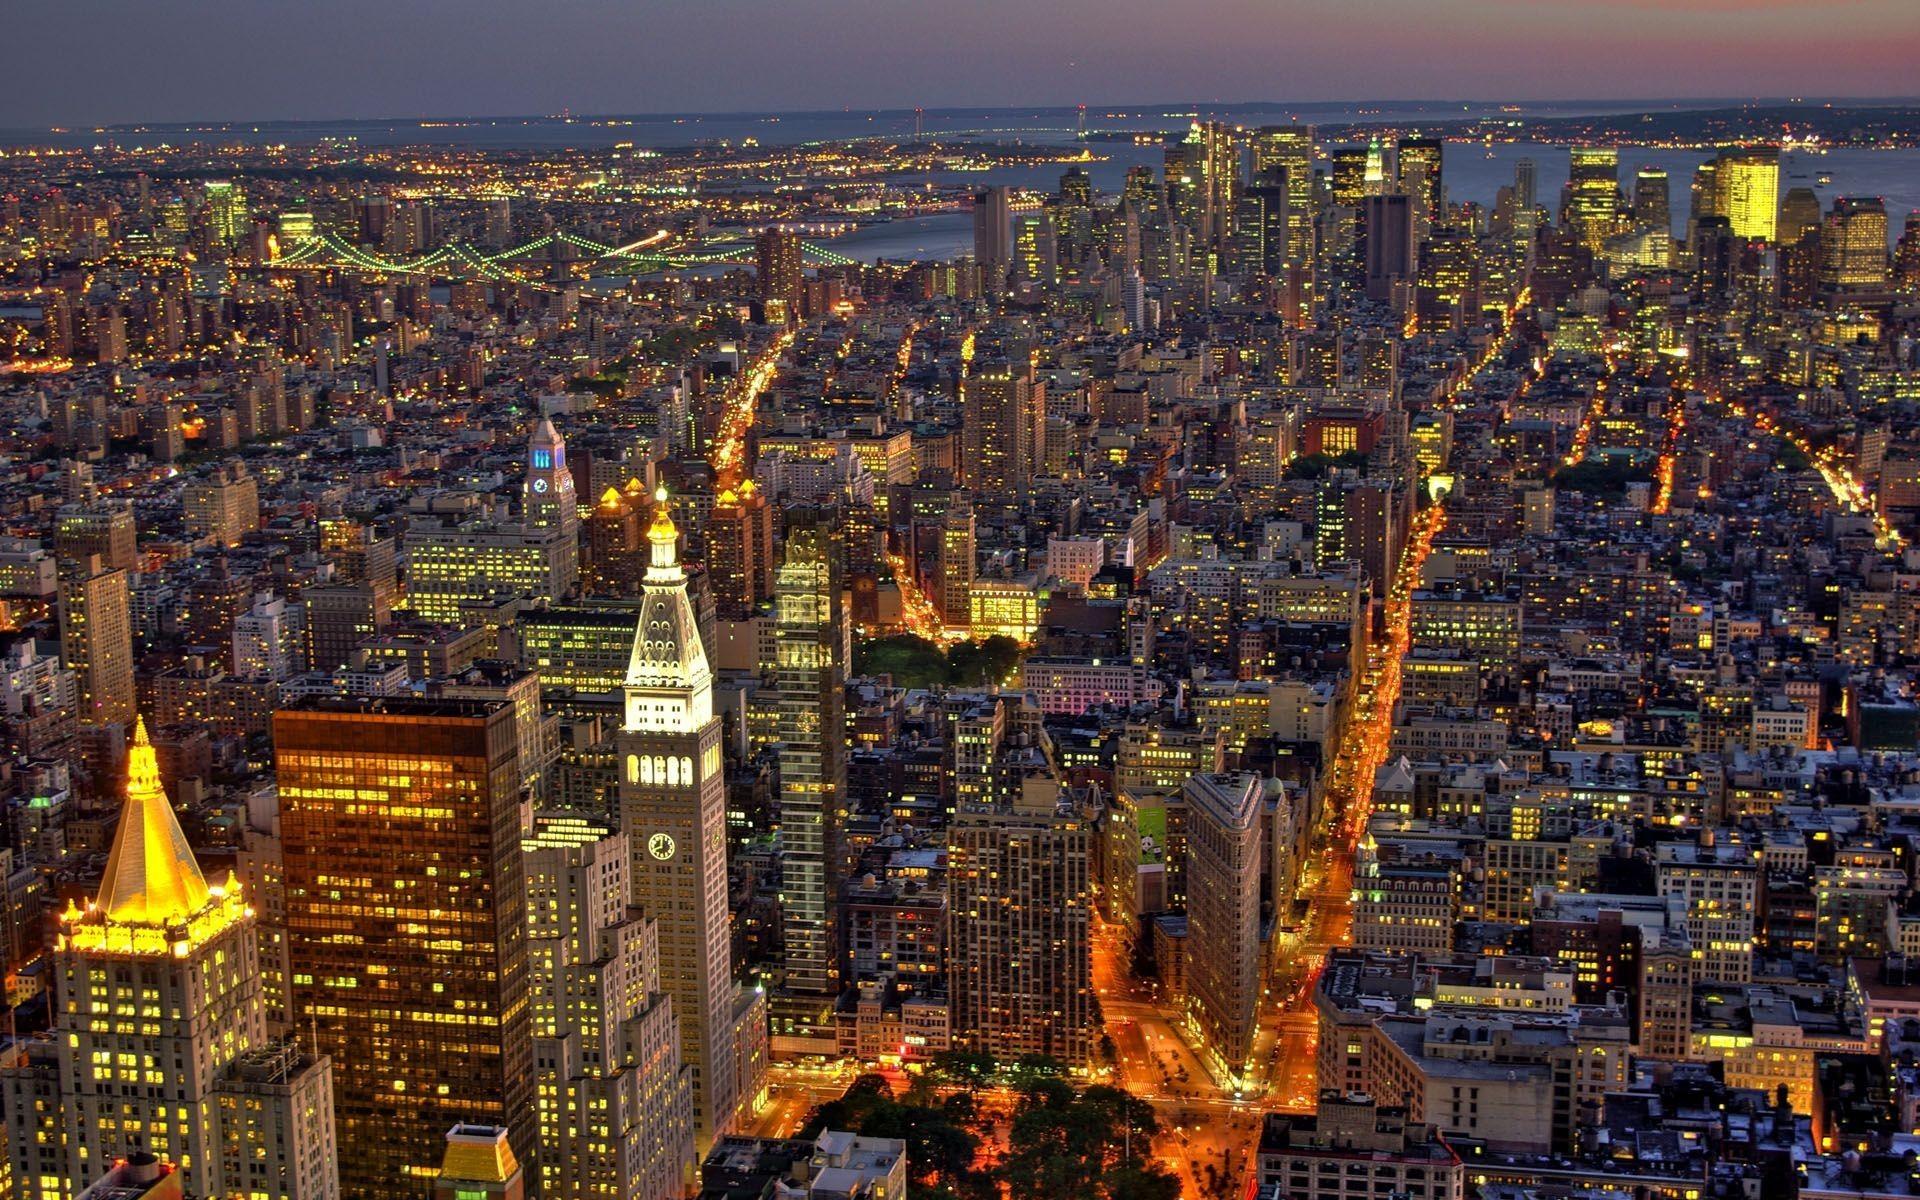 NYC At Night Wallpapers – Wallpaper Cave | Beautiful Wallpapers | Pinterest  | Wallpaper